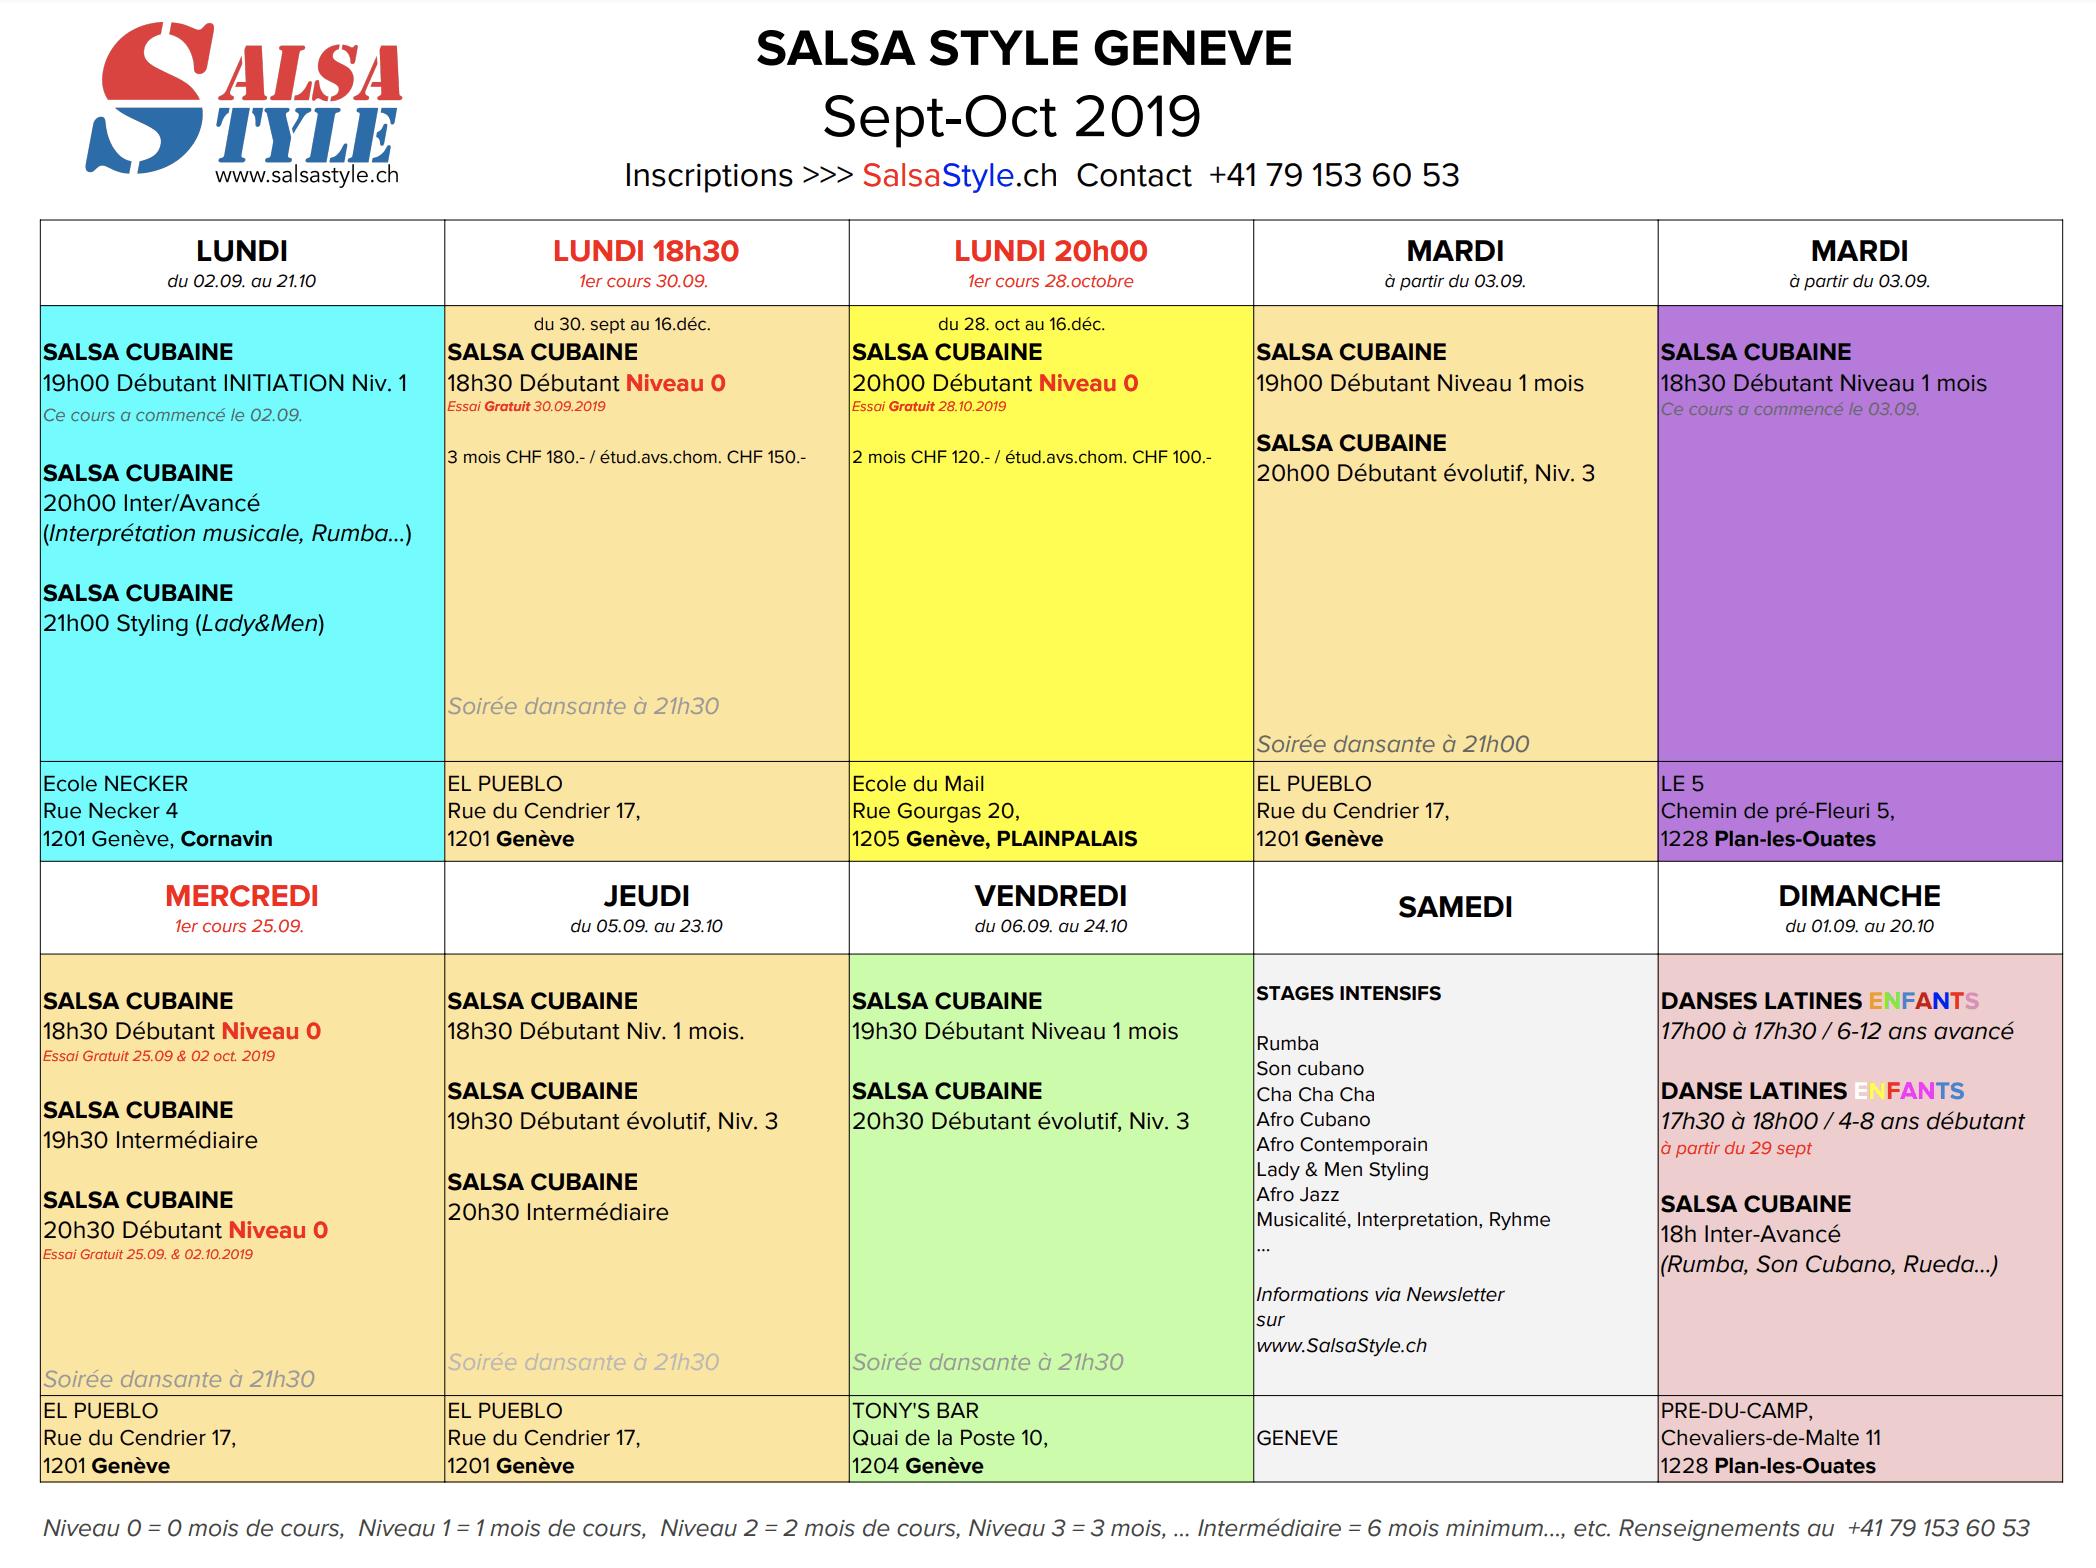 2019 SALSA à Genève salsastyle.ch